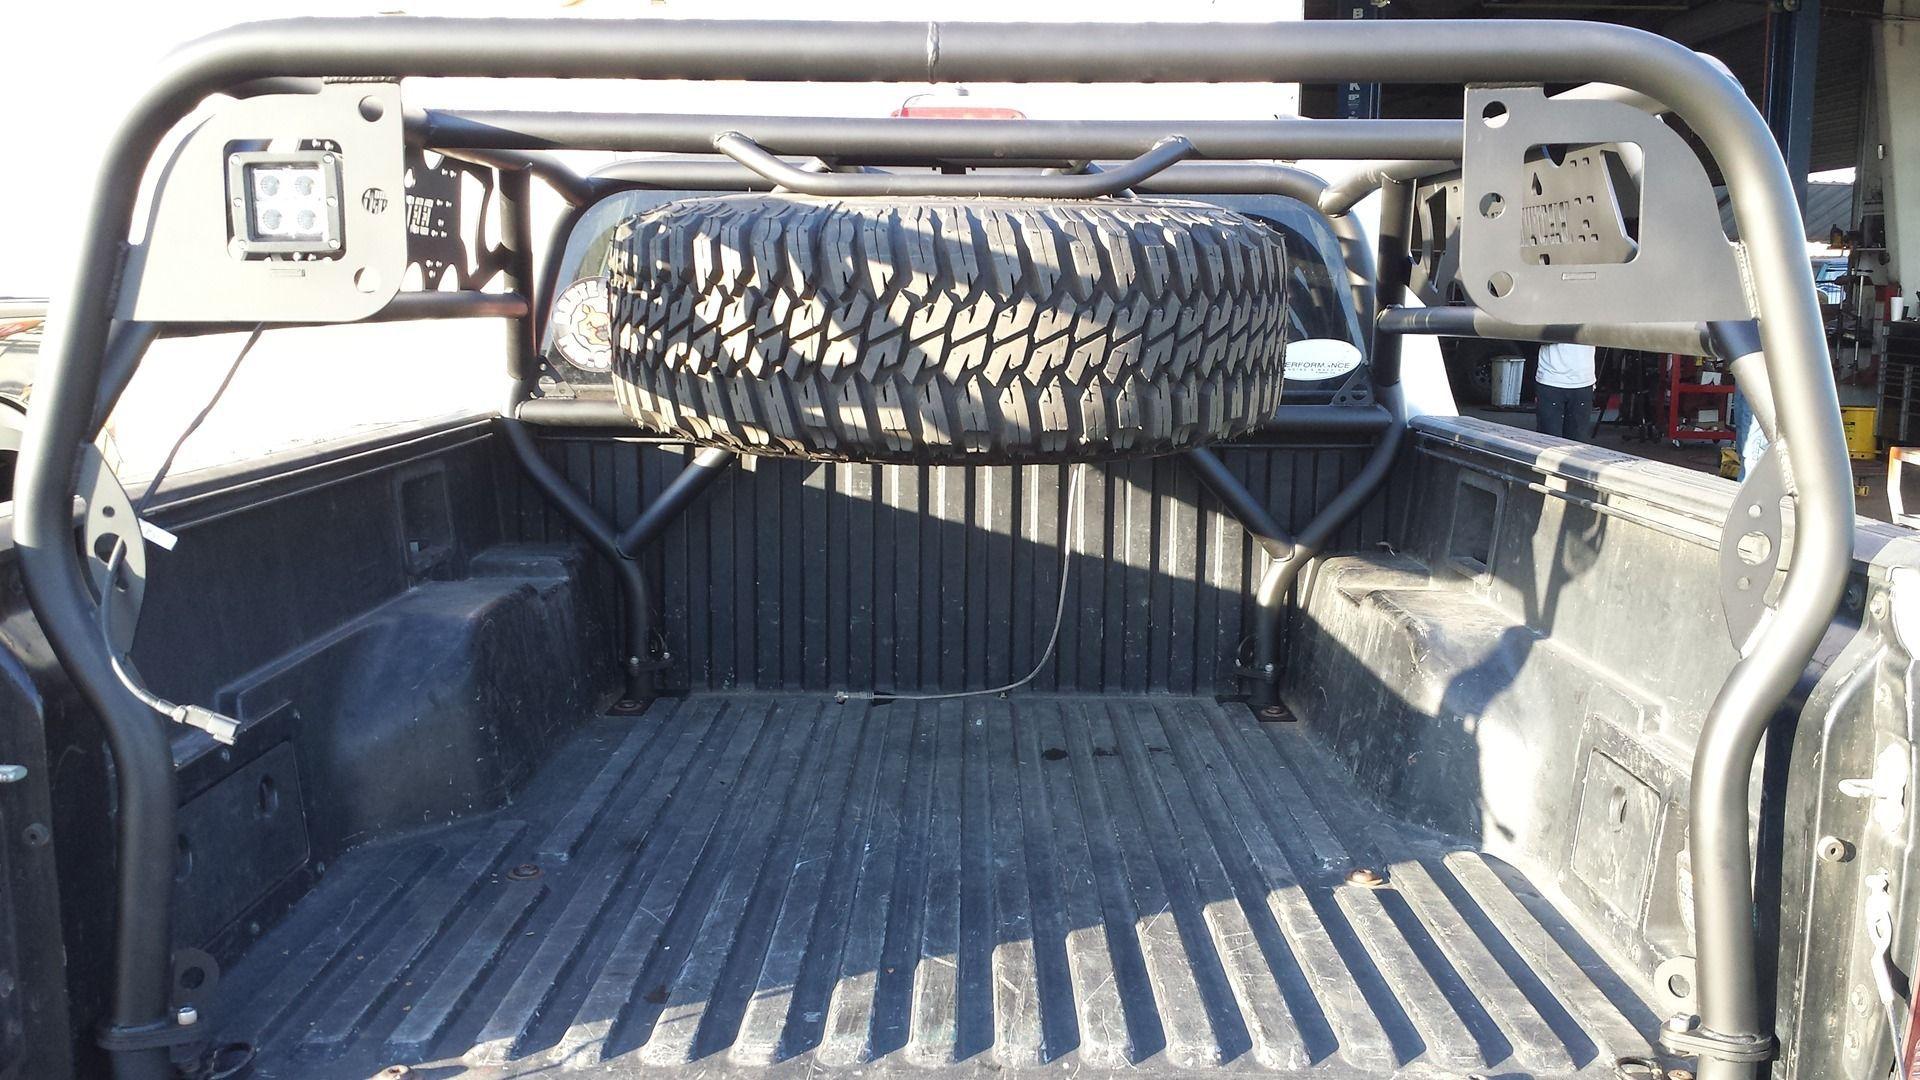 Image result for steel frame truck bed toyota Truck bed